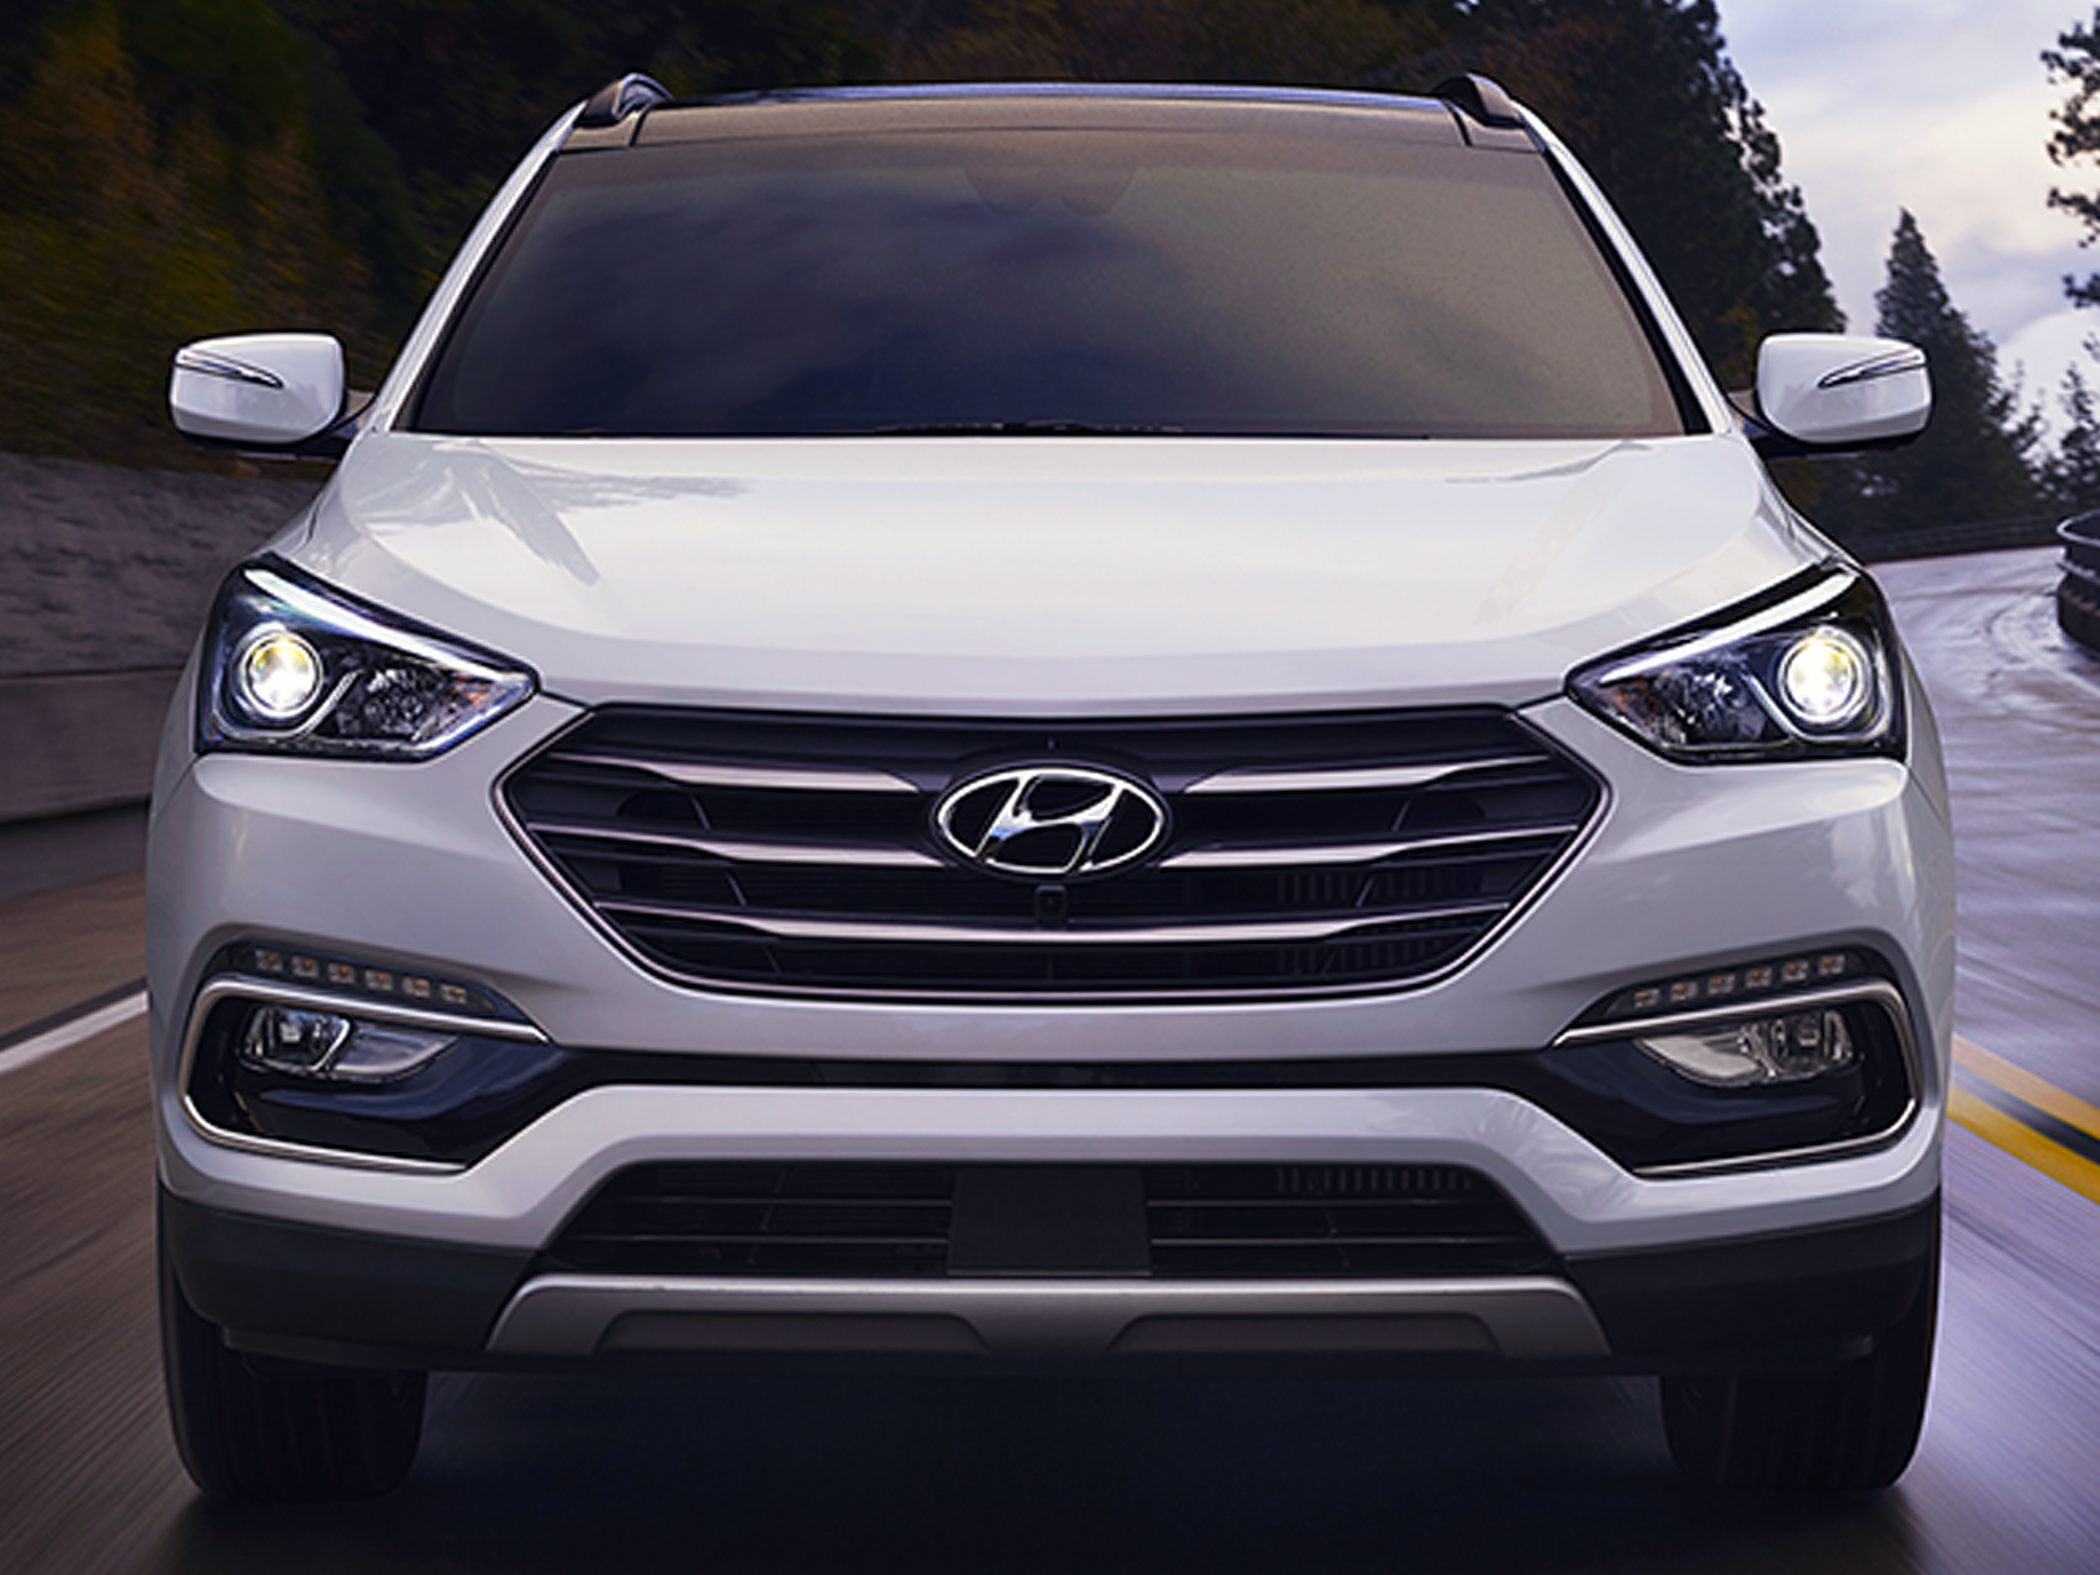 2018 Hyundai Santa Fe Sport For Sale In Mississauga Mississauga